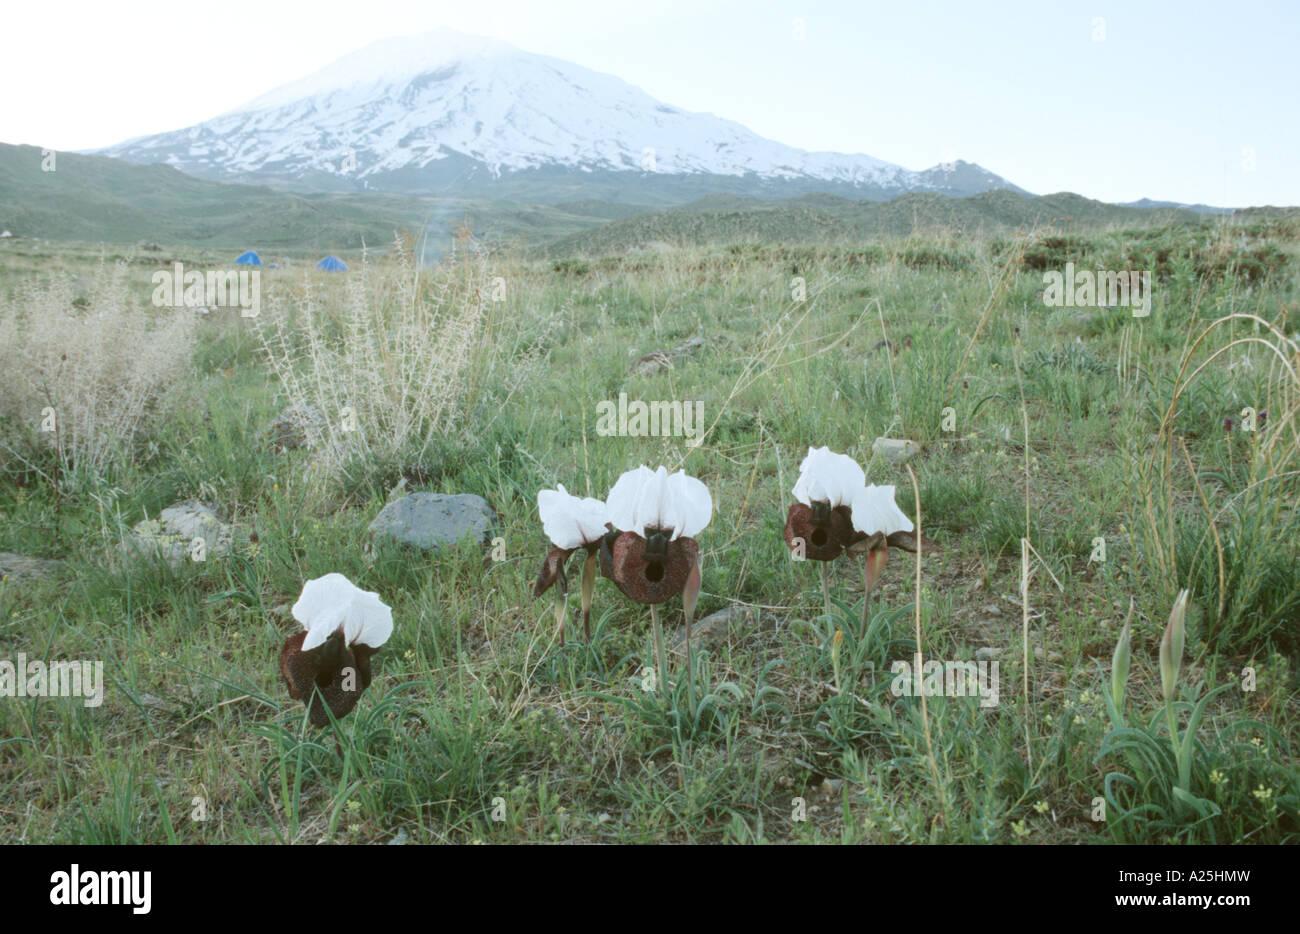 Oncocyclus bearded Iris (Iris iberica ssp. elegantissima), blooming in front of Ararat, Turkey, Turkey, East Anatolia, - Stock Image